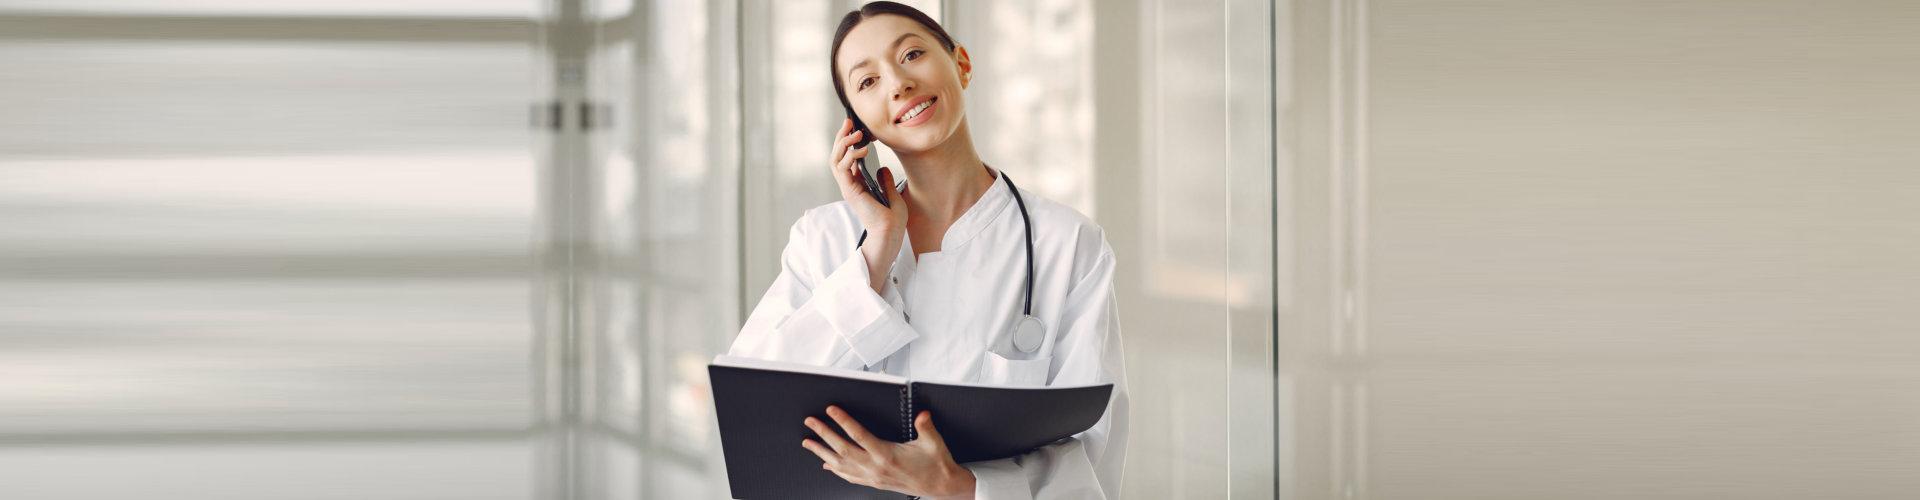 nurse calling to her patient